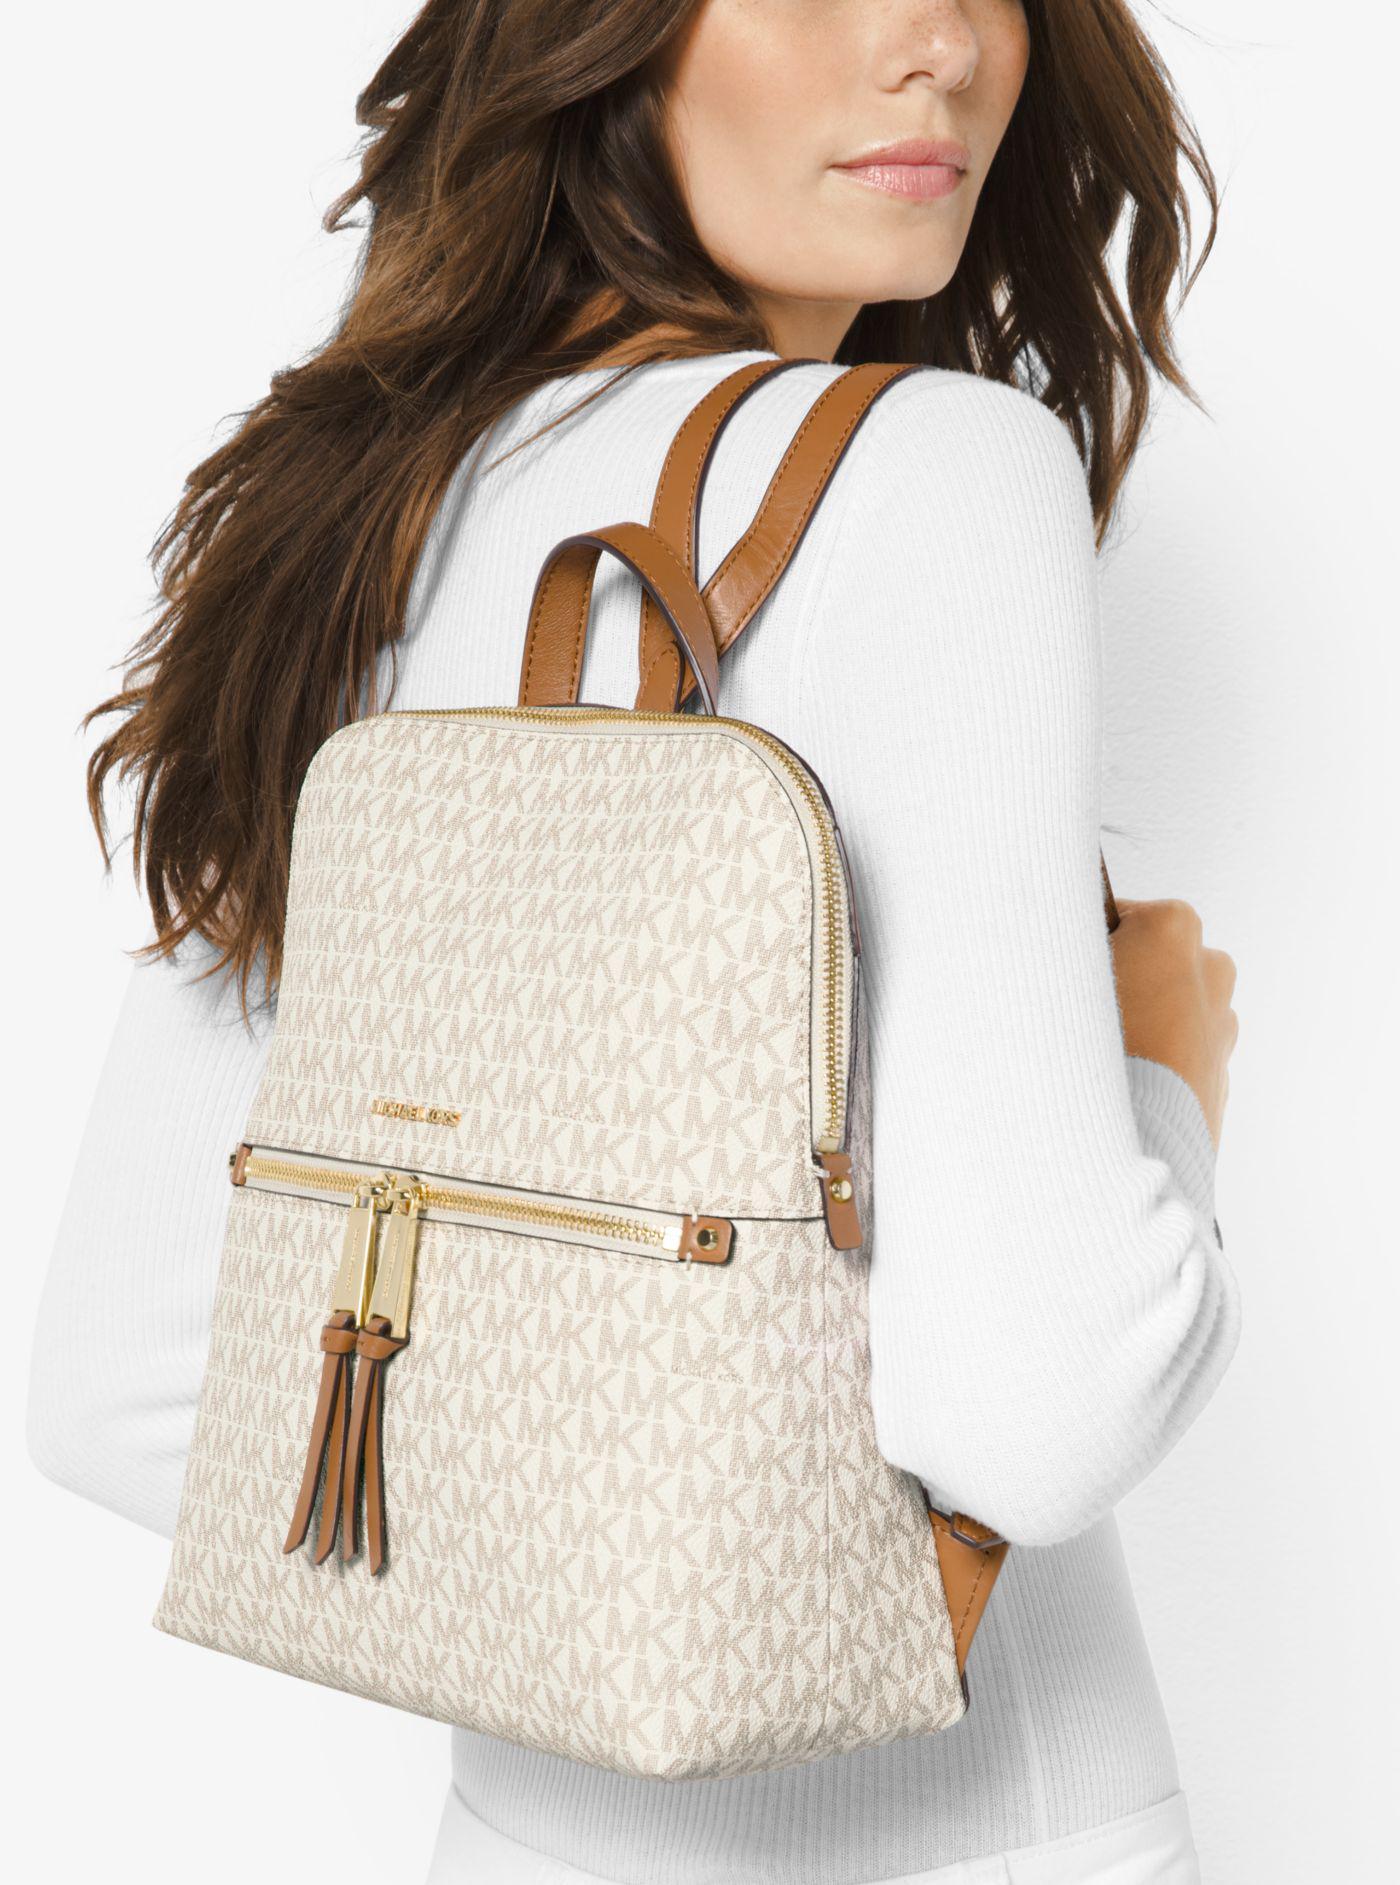 4f9937b470 Lyst - Michael Kors Rhea Medium Slim Logo Backpack